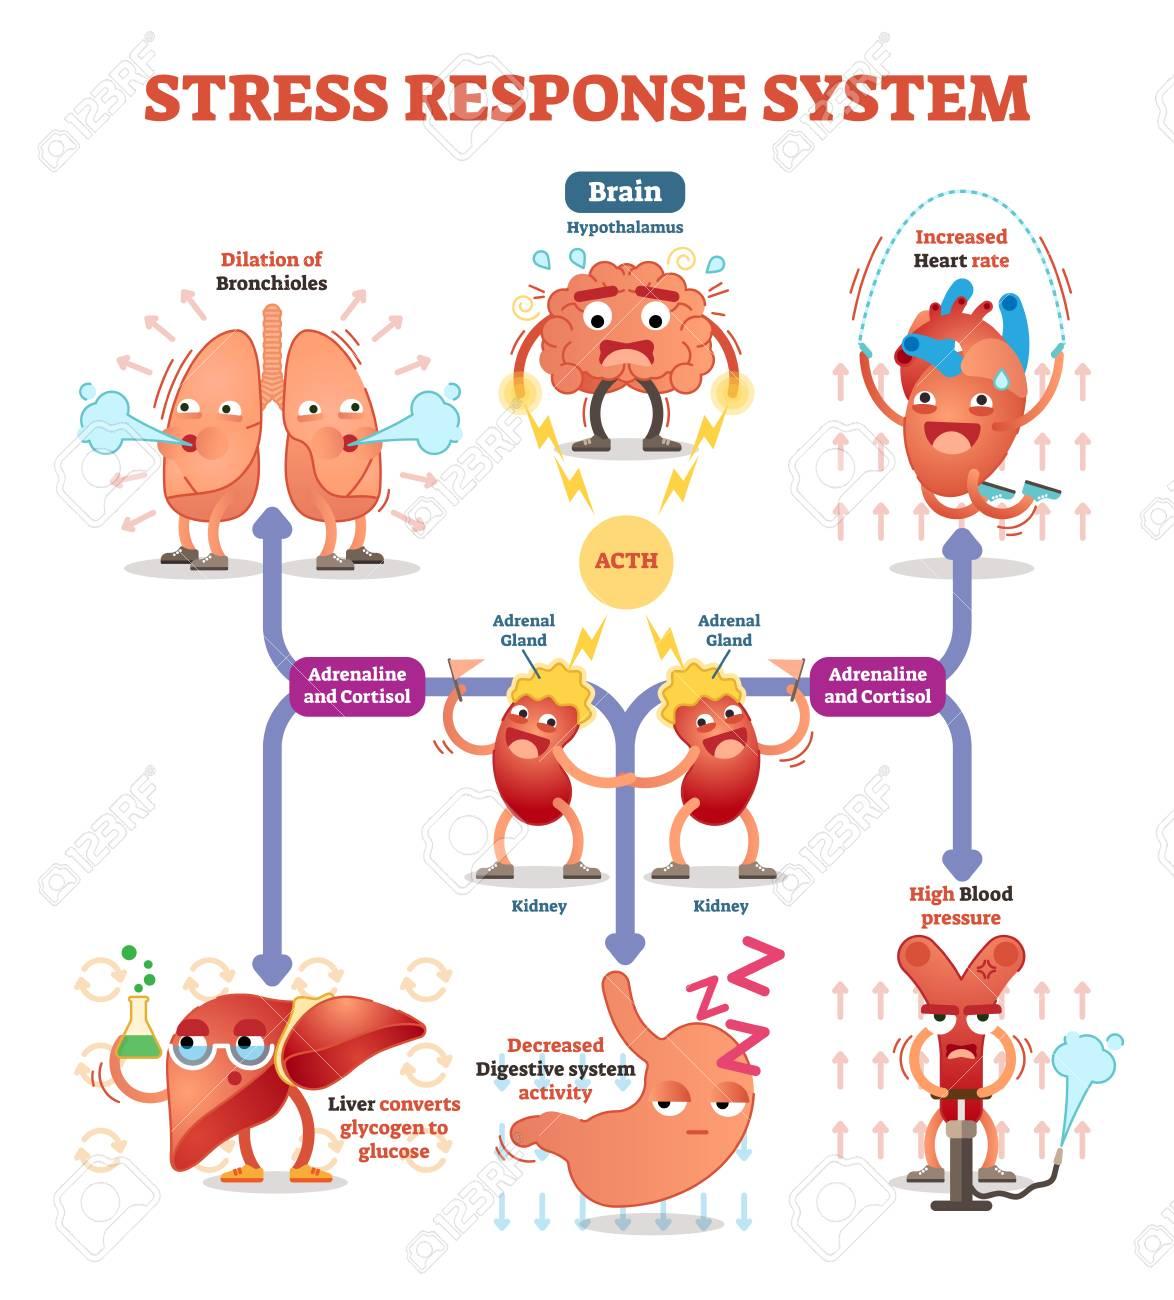 Stress response system vector illustration diagram, nerve impulses scheme. - 96364326